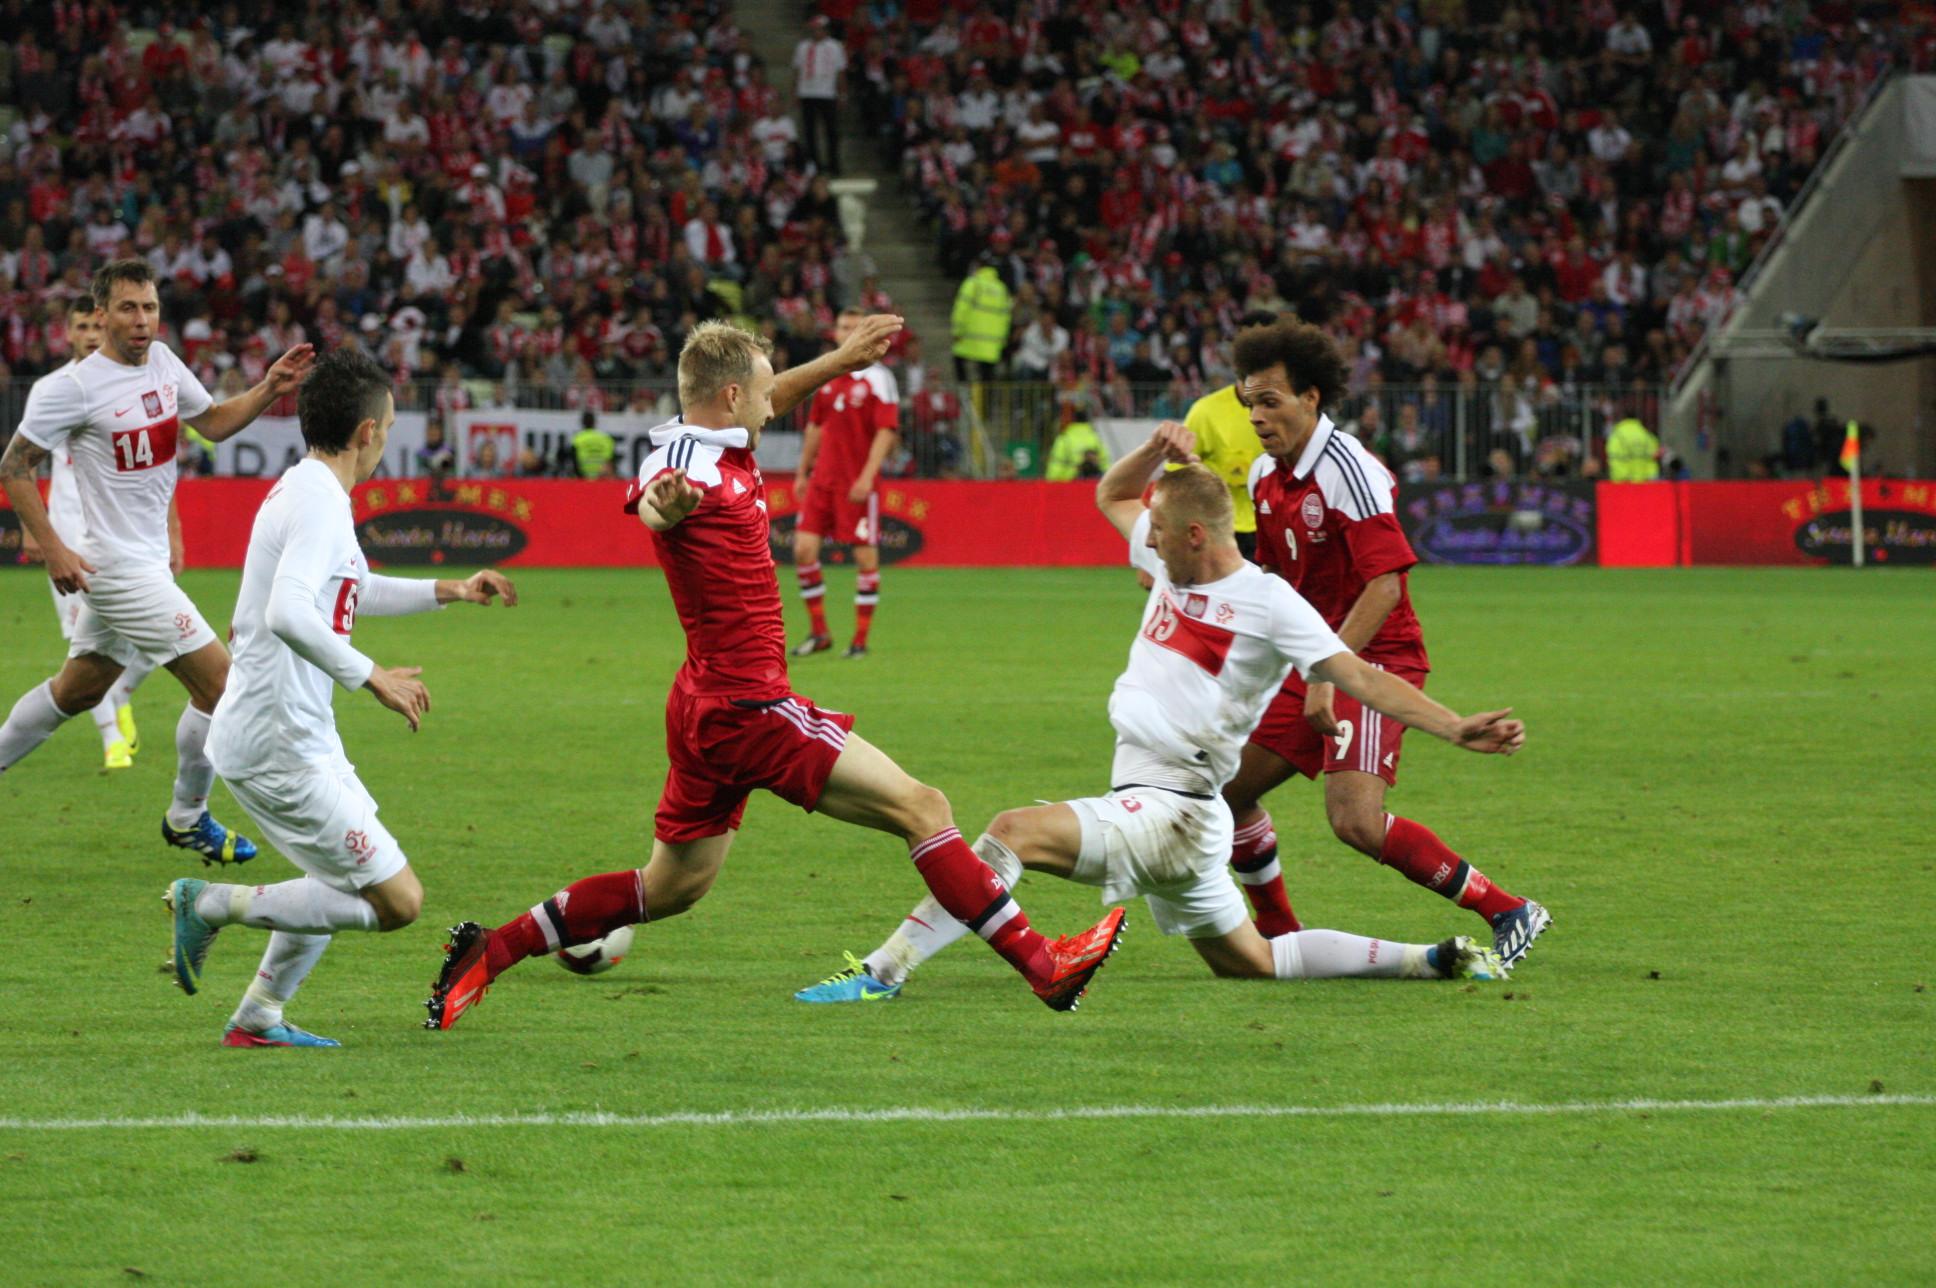 Mecz Polska – Dania